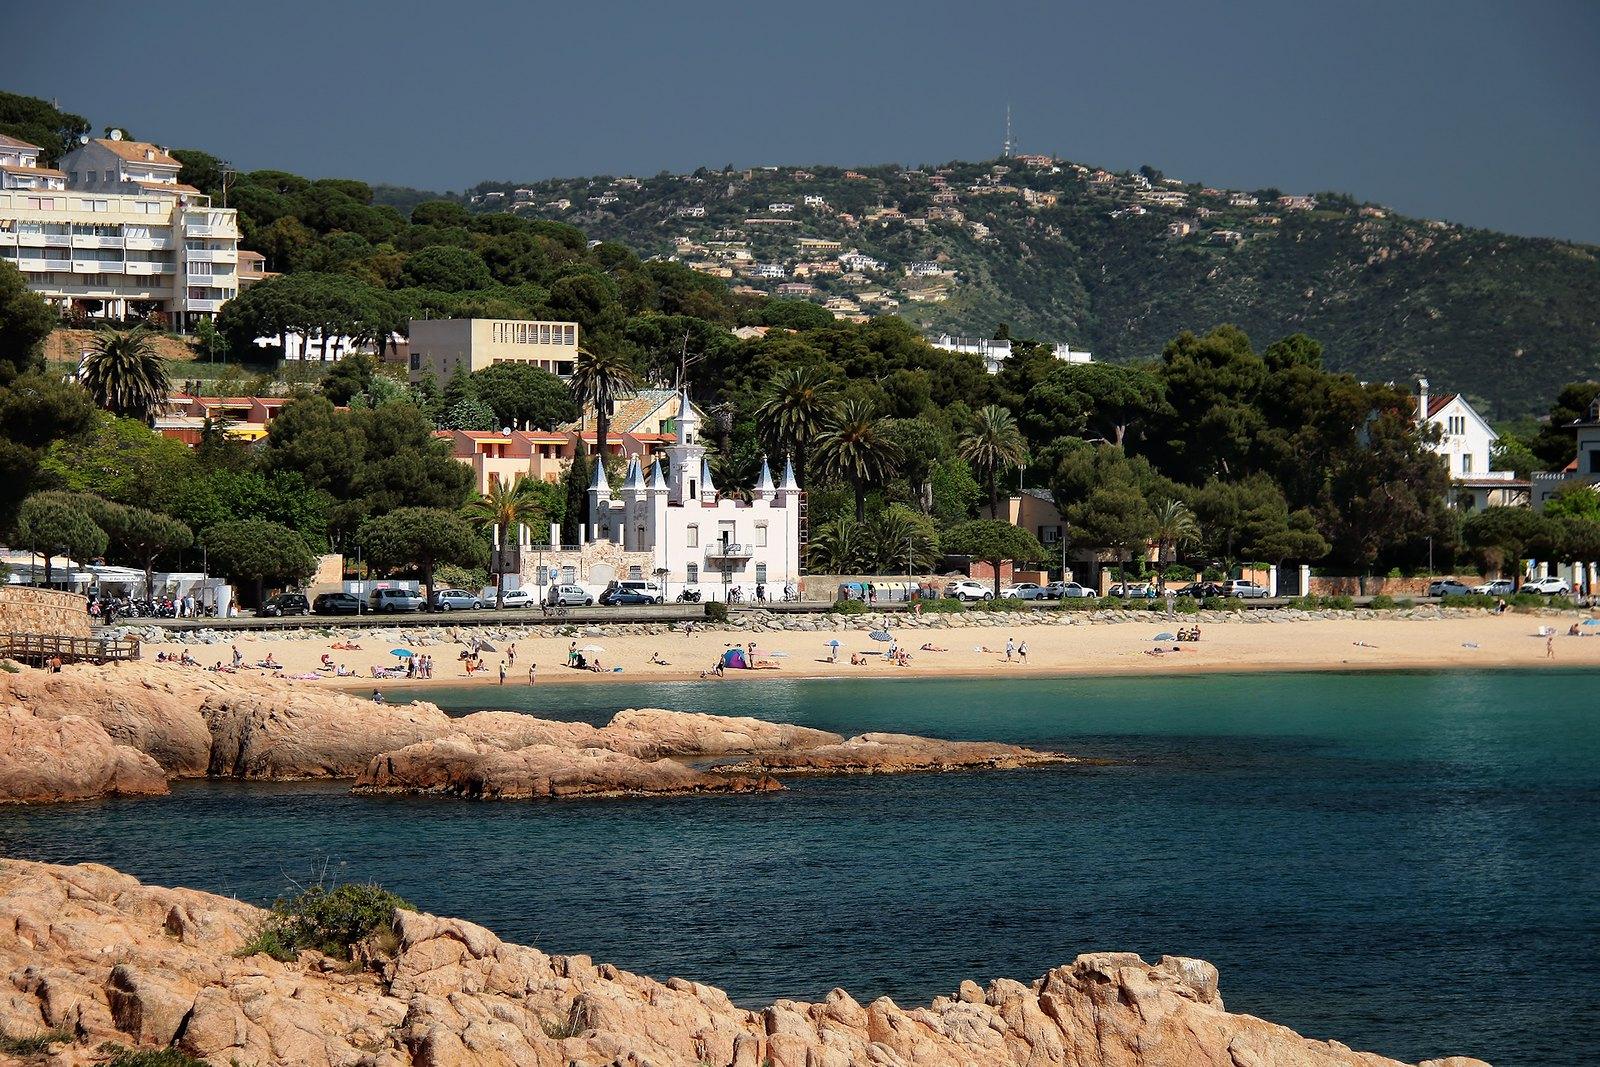 Playa de Sant Pol - Playas cerca de Barcelona